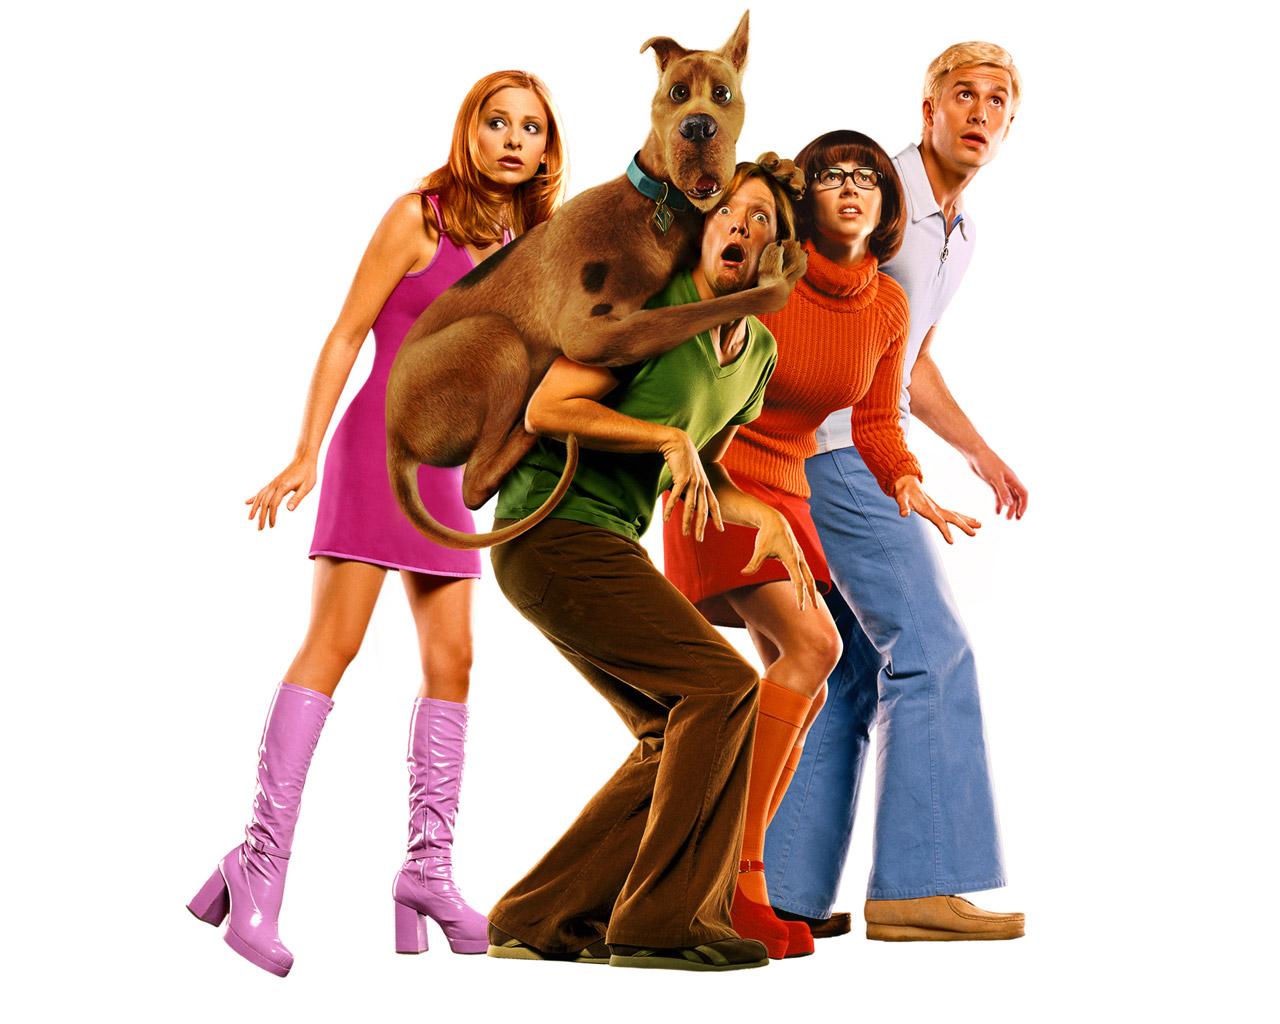 http://3.bp.blogspot.com/-wzl2fhZkNmI/TqJssIlfNMI/AAAAAAAAB2Y/k0Q5X1B1F9g/s1600/Scooby-Doo%252C_2002%252C_Freddie_Prinze_Jr.%252C_Sarah_Michelle_Gellar%252C_Matthew_Lillard%252C_Linda_Cardellini.jpg